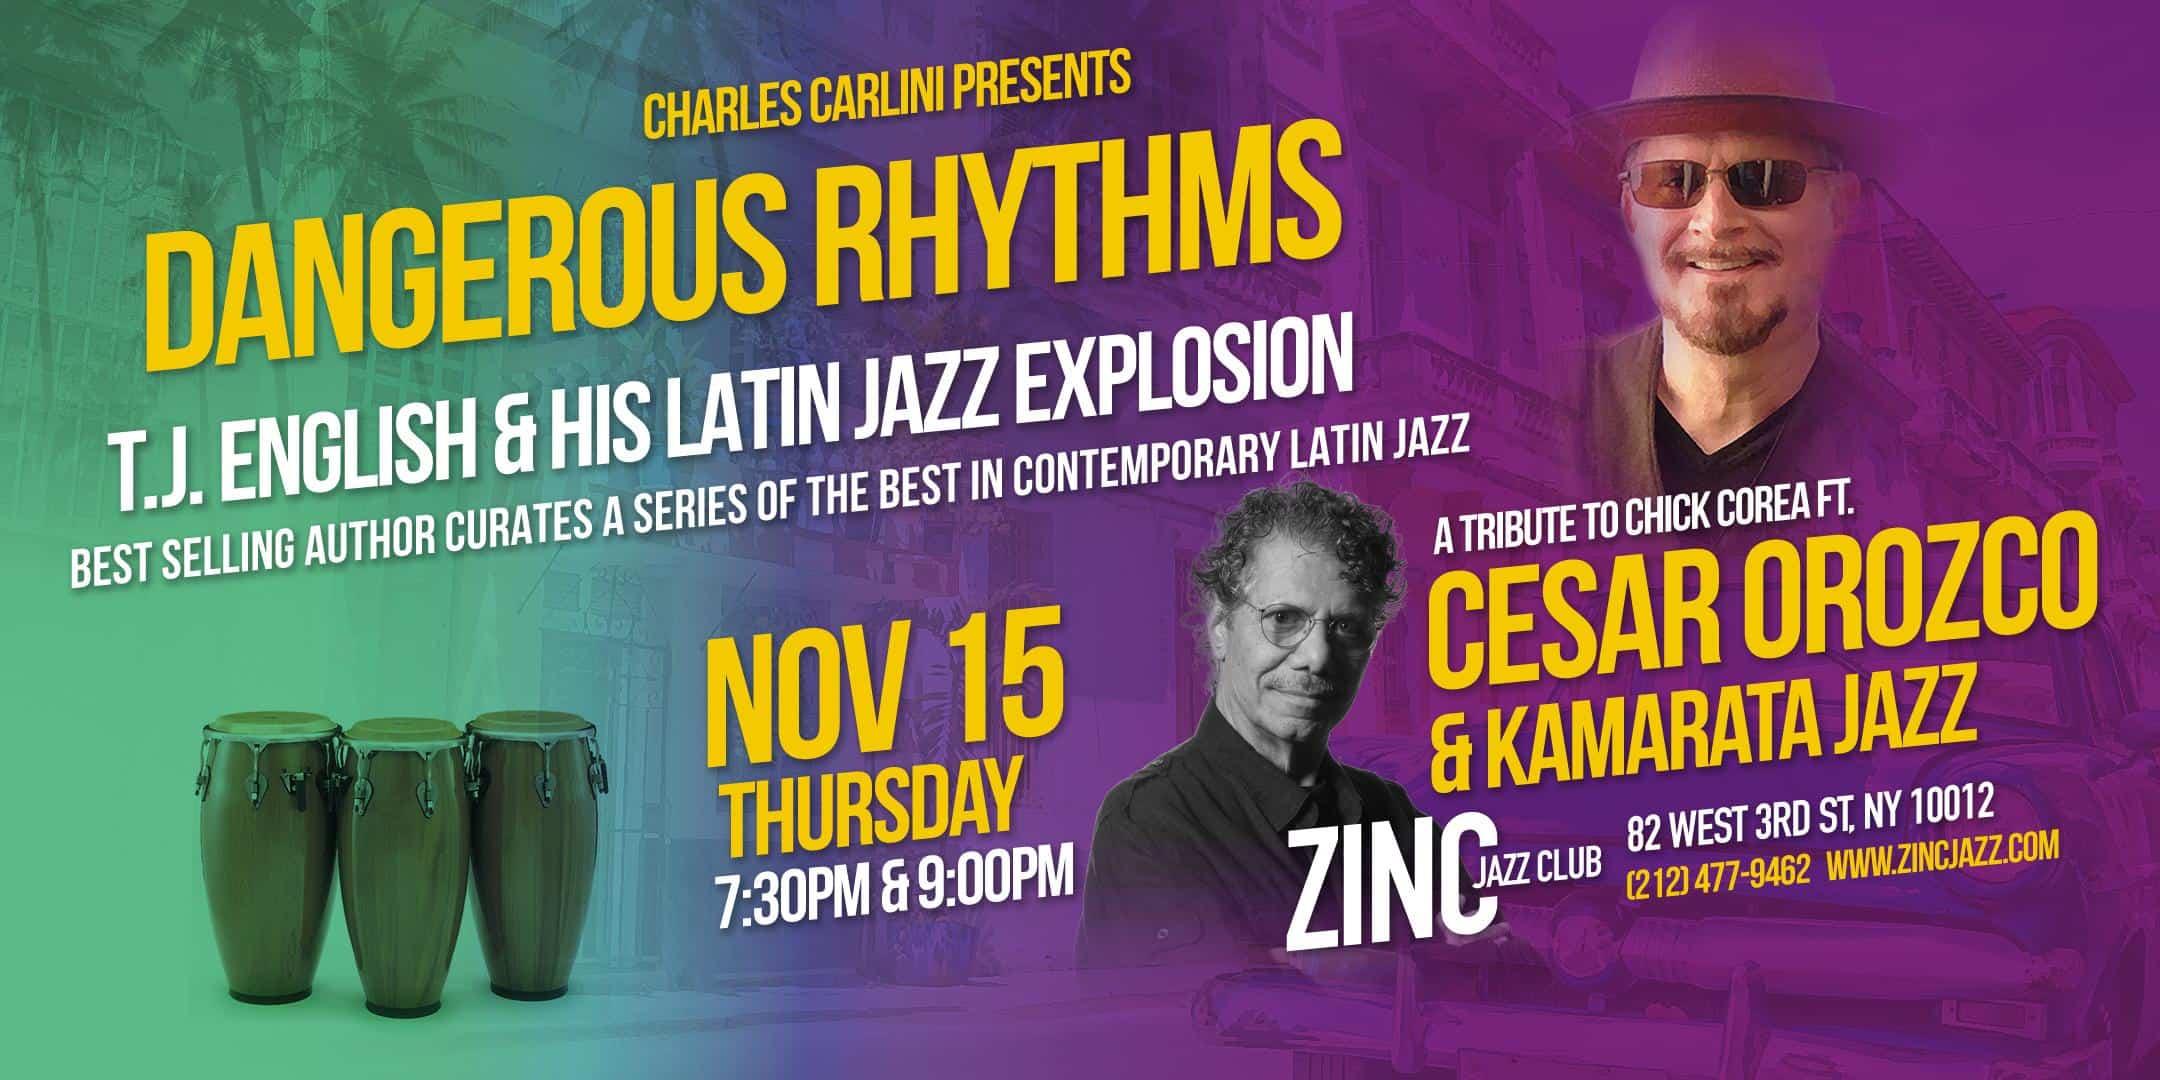 Dangerous Rhythms: A Tribute to Chick Corea ft. Cesar Orozco & Kamarata Jazz